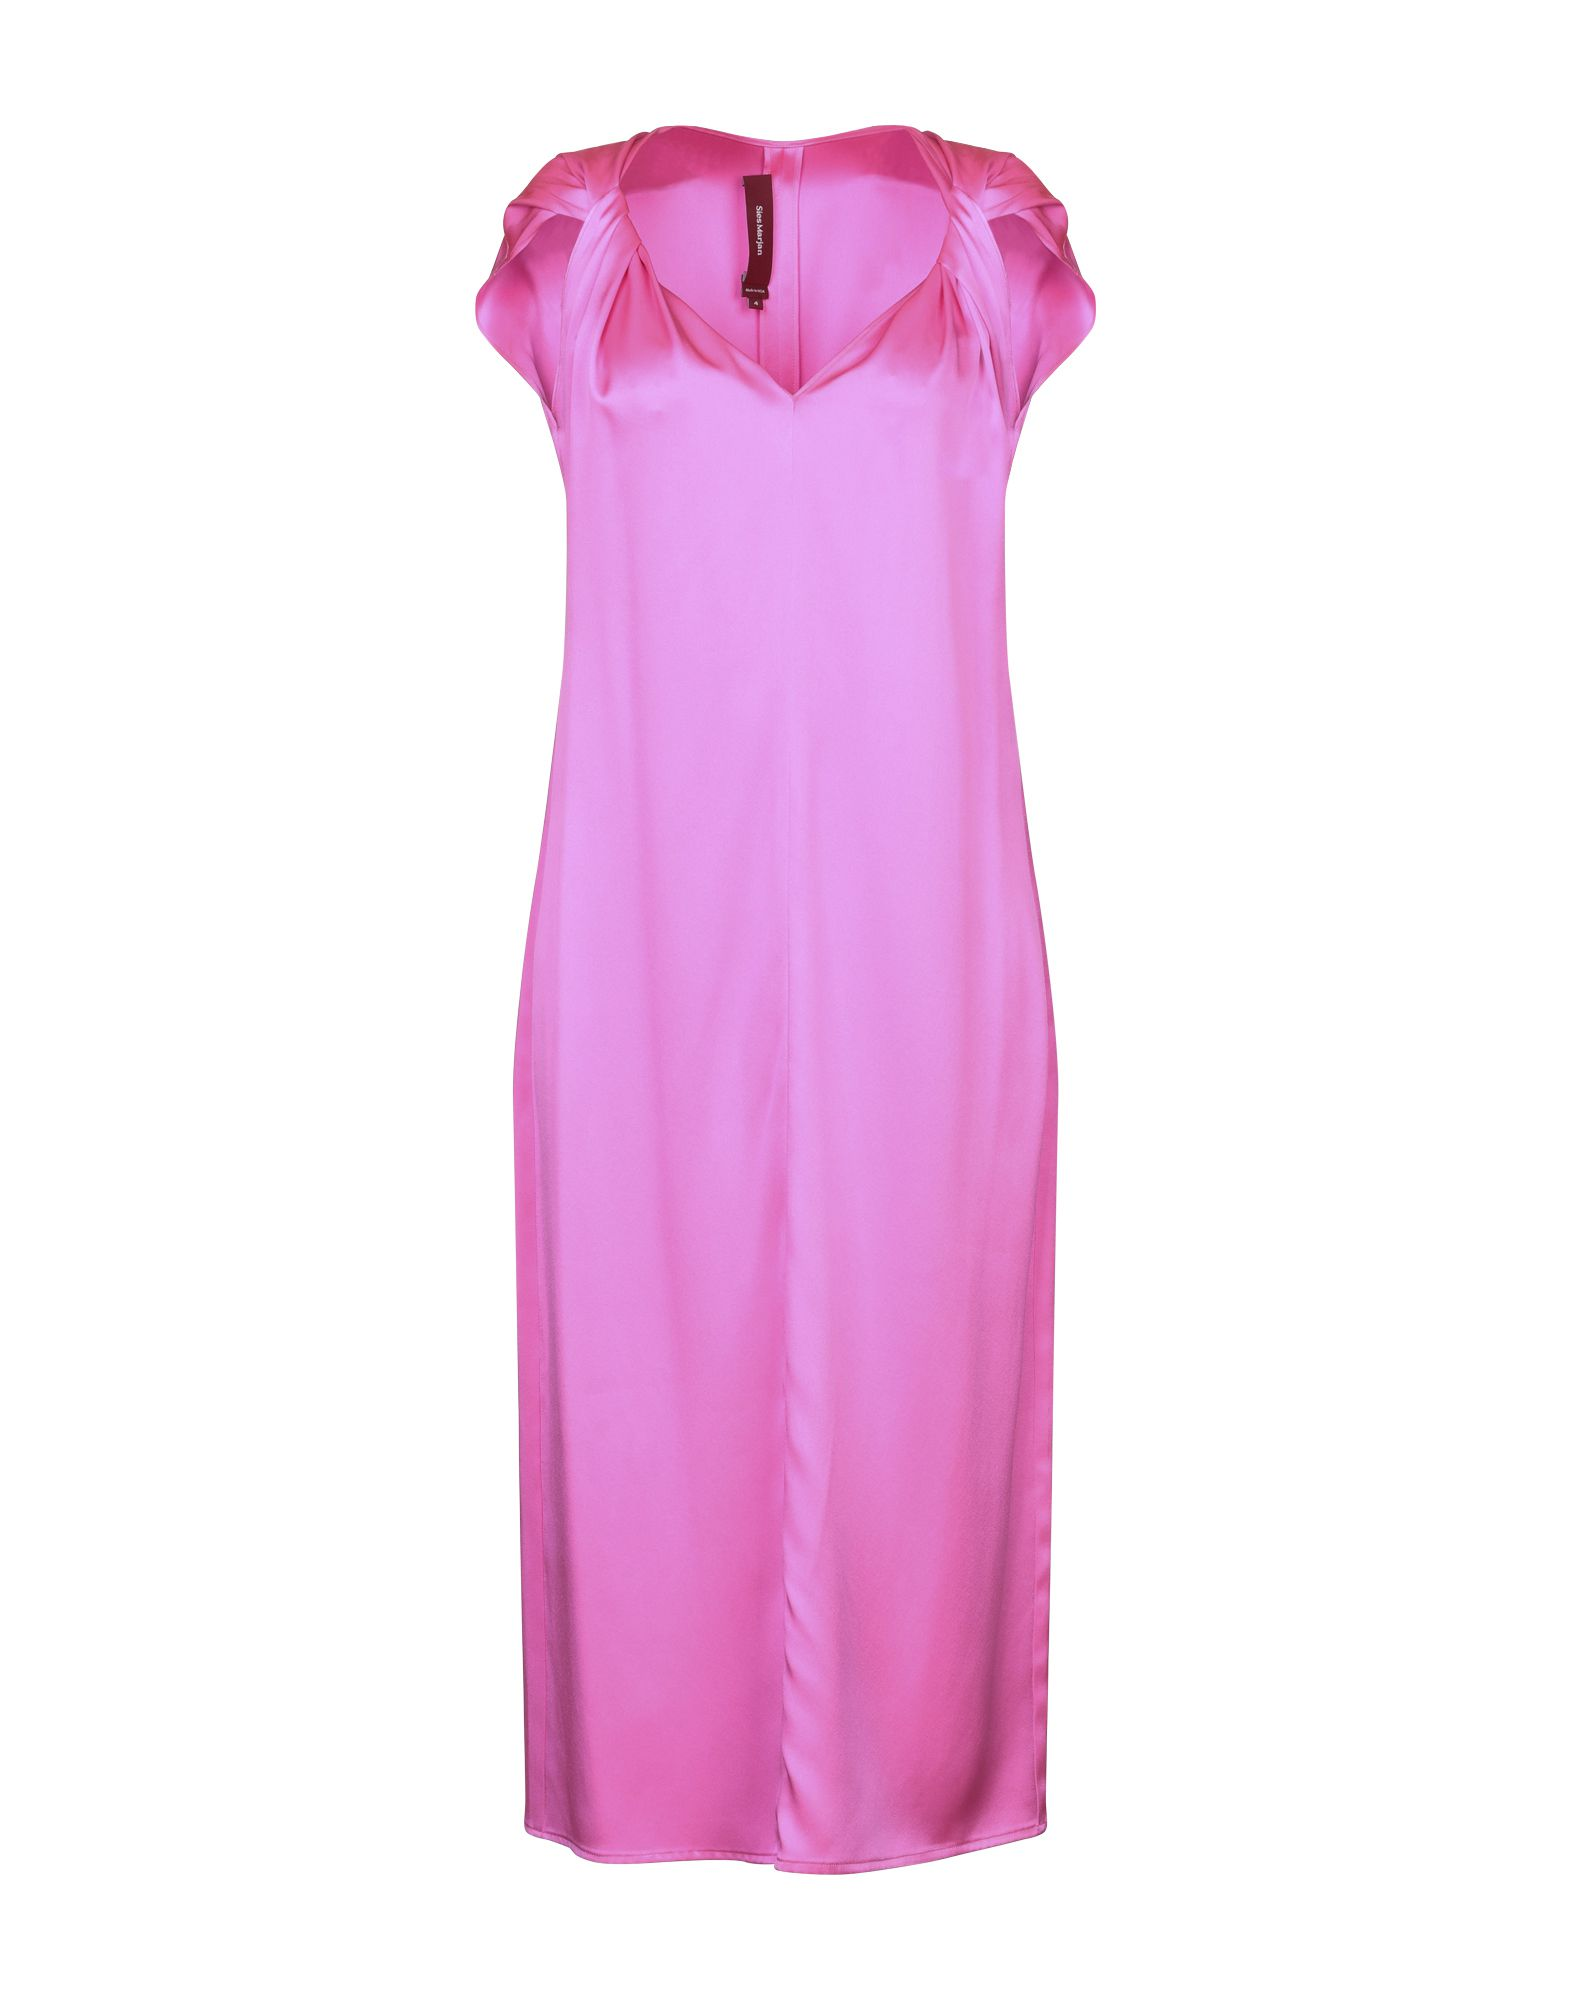 цена SIES MARJAN Платье длиной 3/4 онлайн в 2017 году